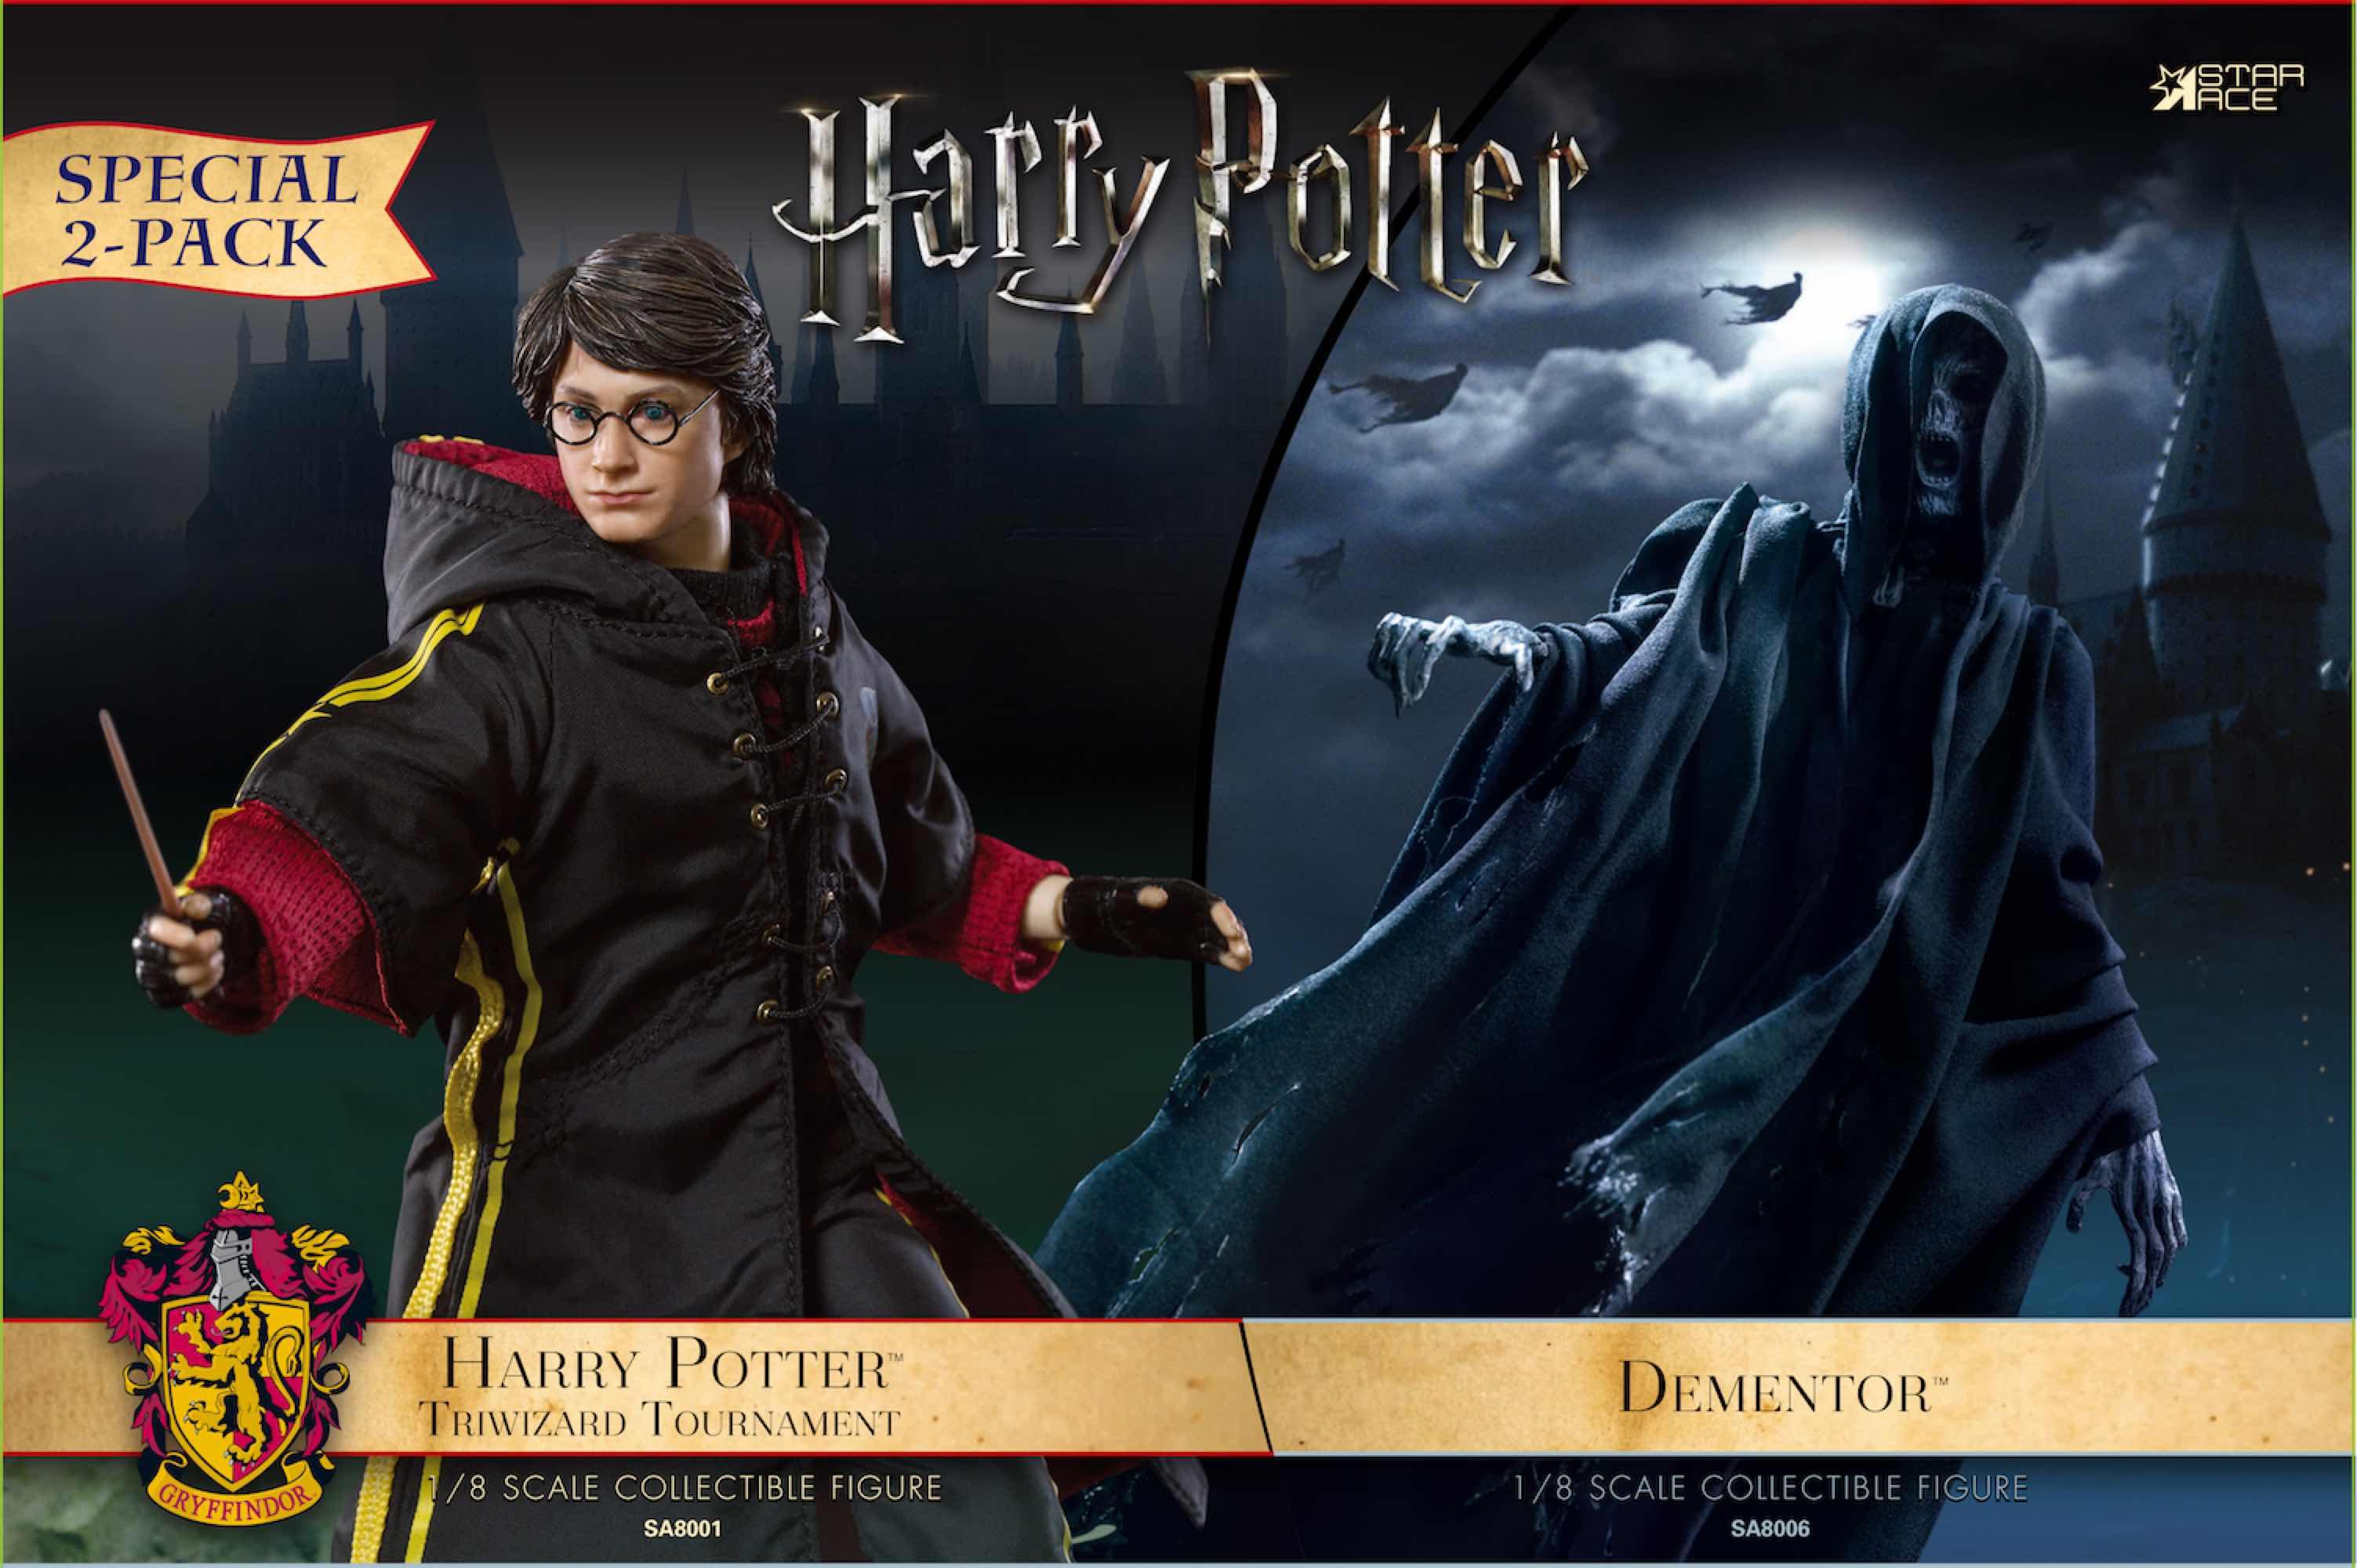 DEMENTOR & HARRY POTTER FIGURA 16 CM HARRY POTTER STAR ACE